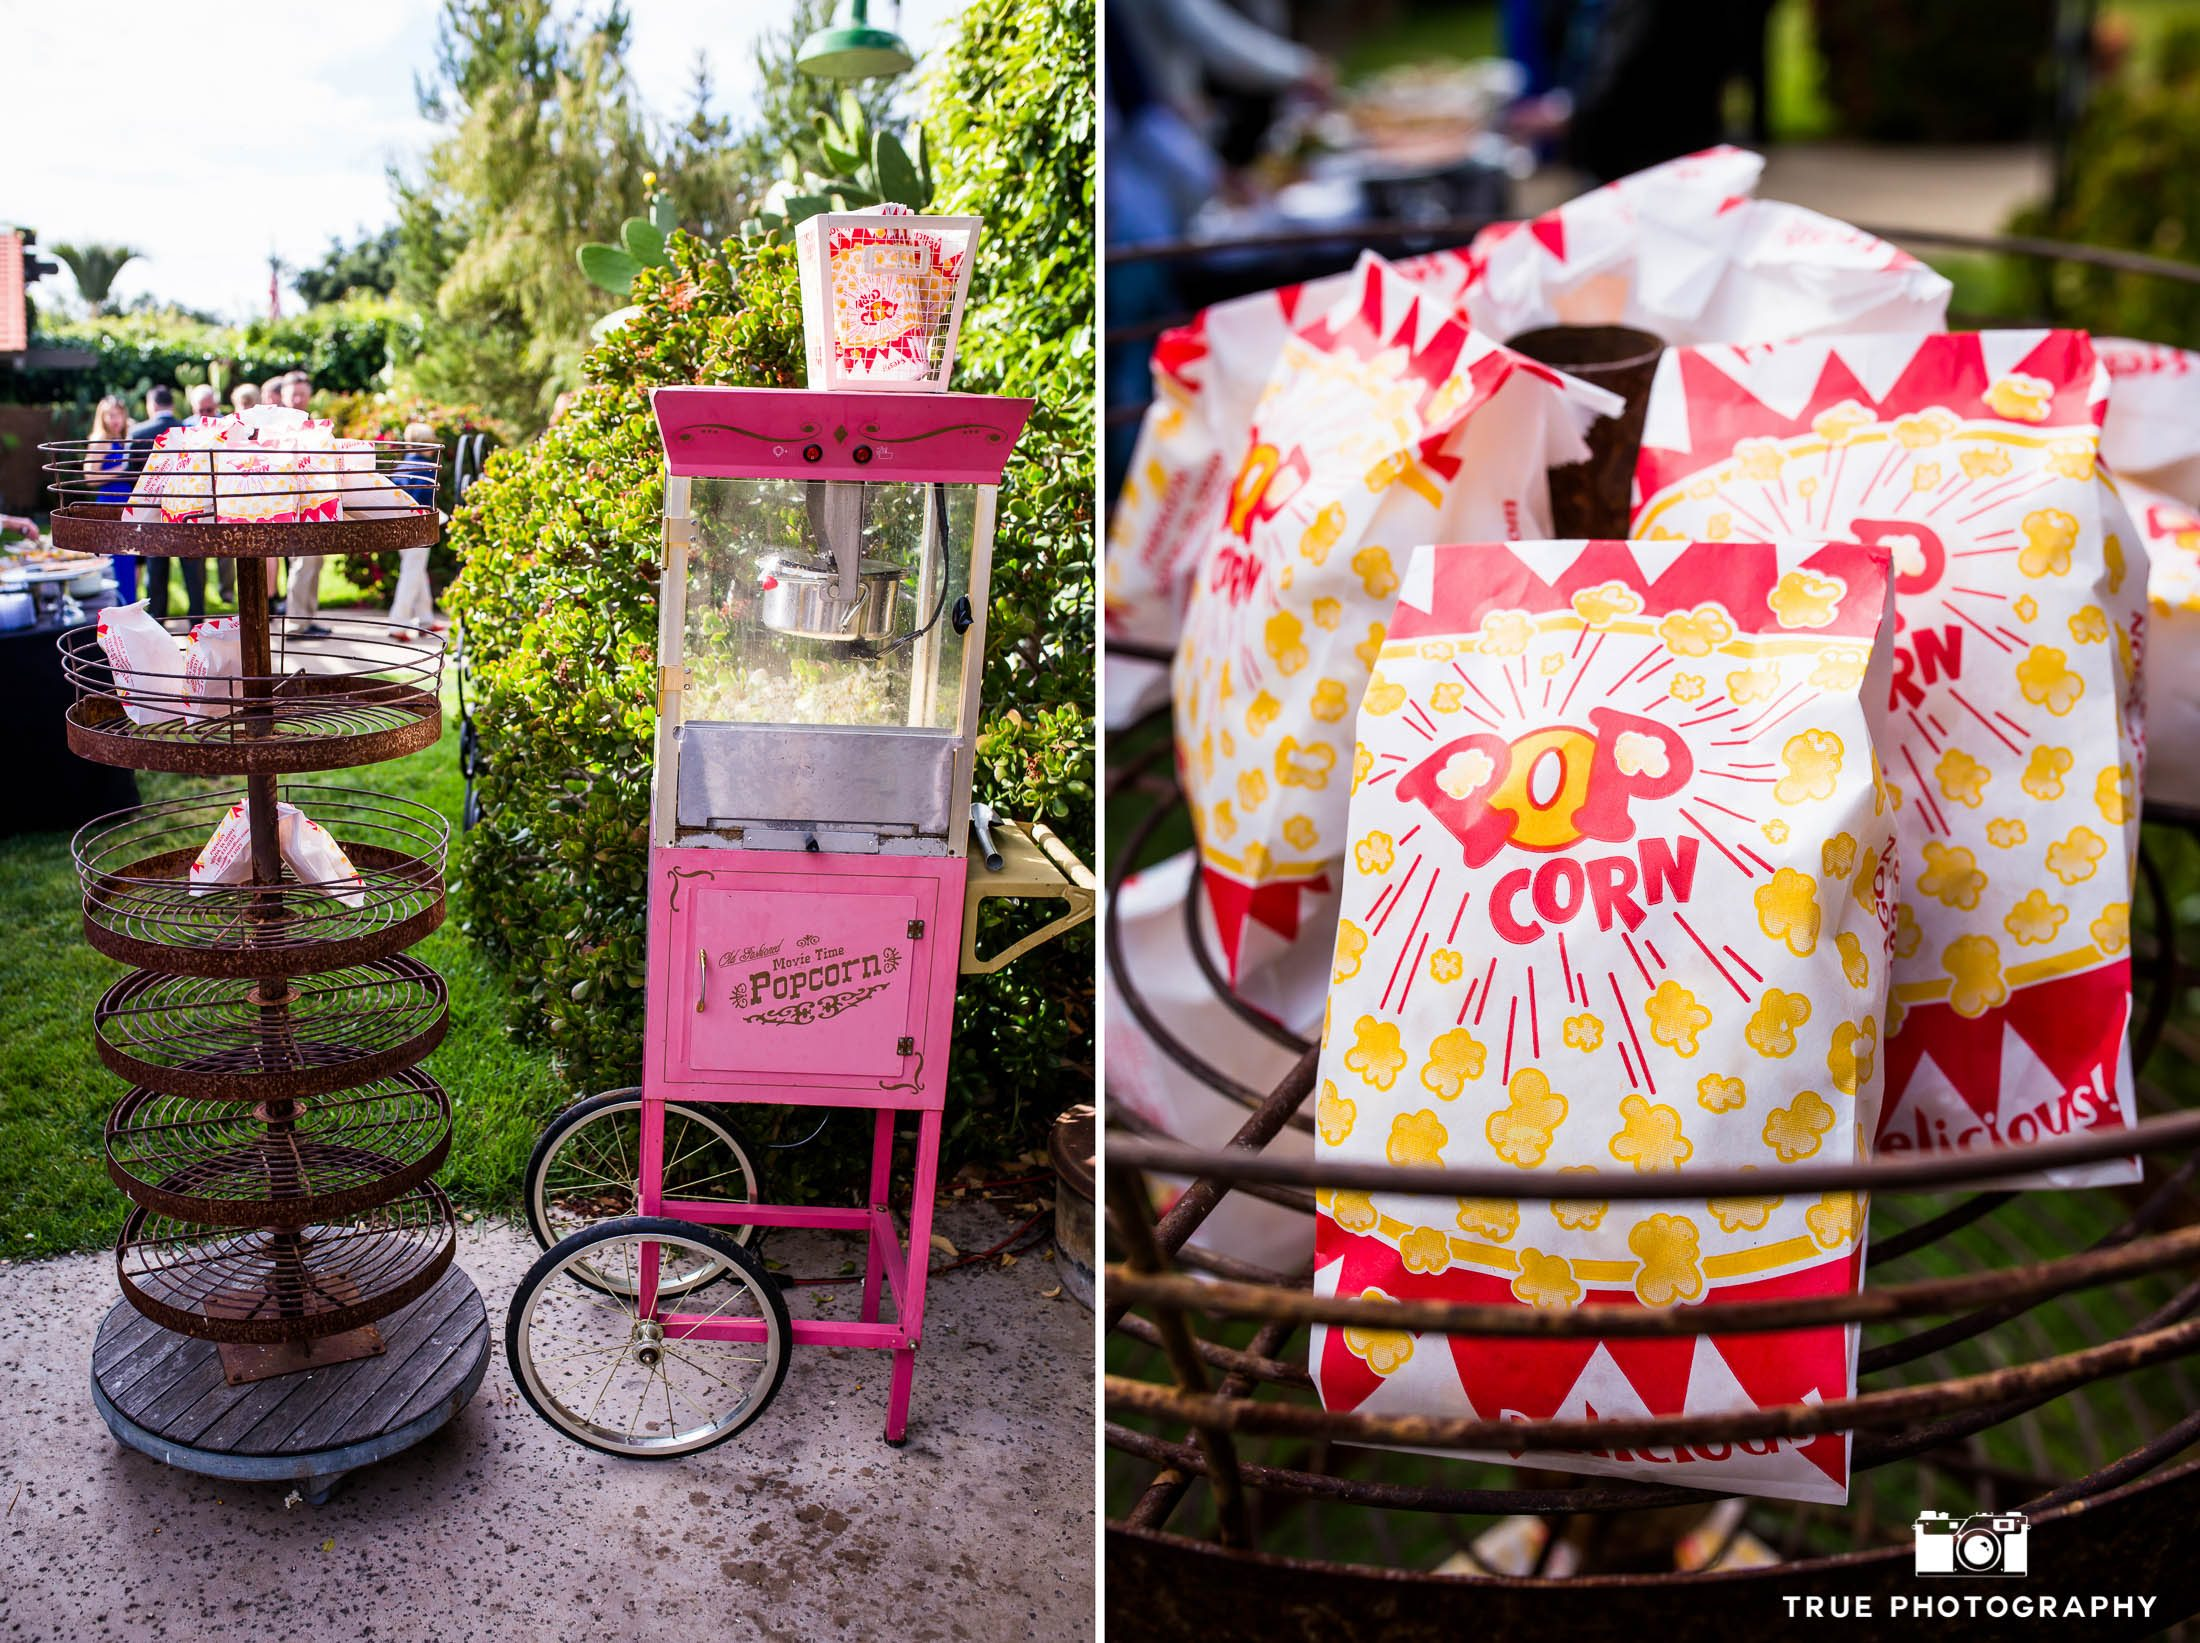 Fun and creative vintage popcorn machine during rustic outdoor wedding reception